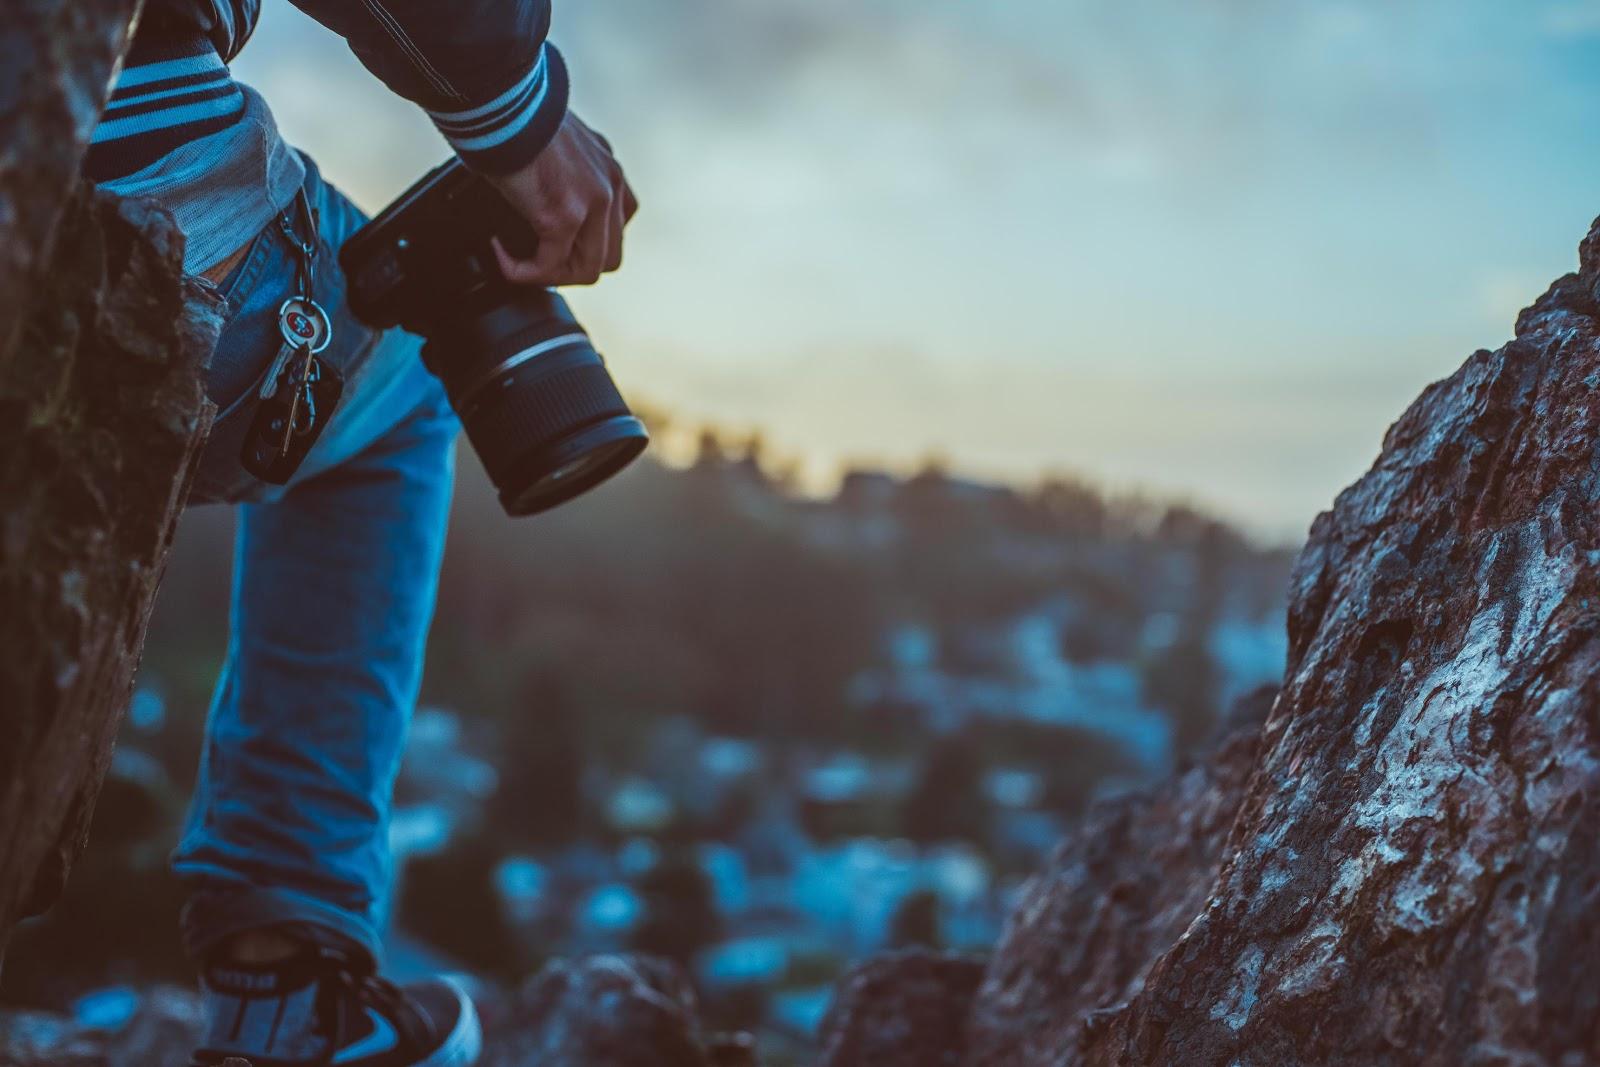 Fotograferen als hobby